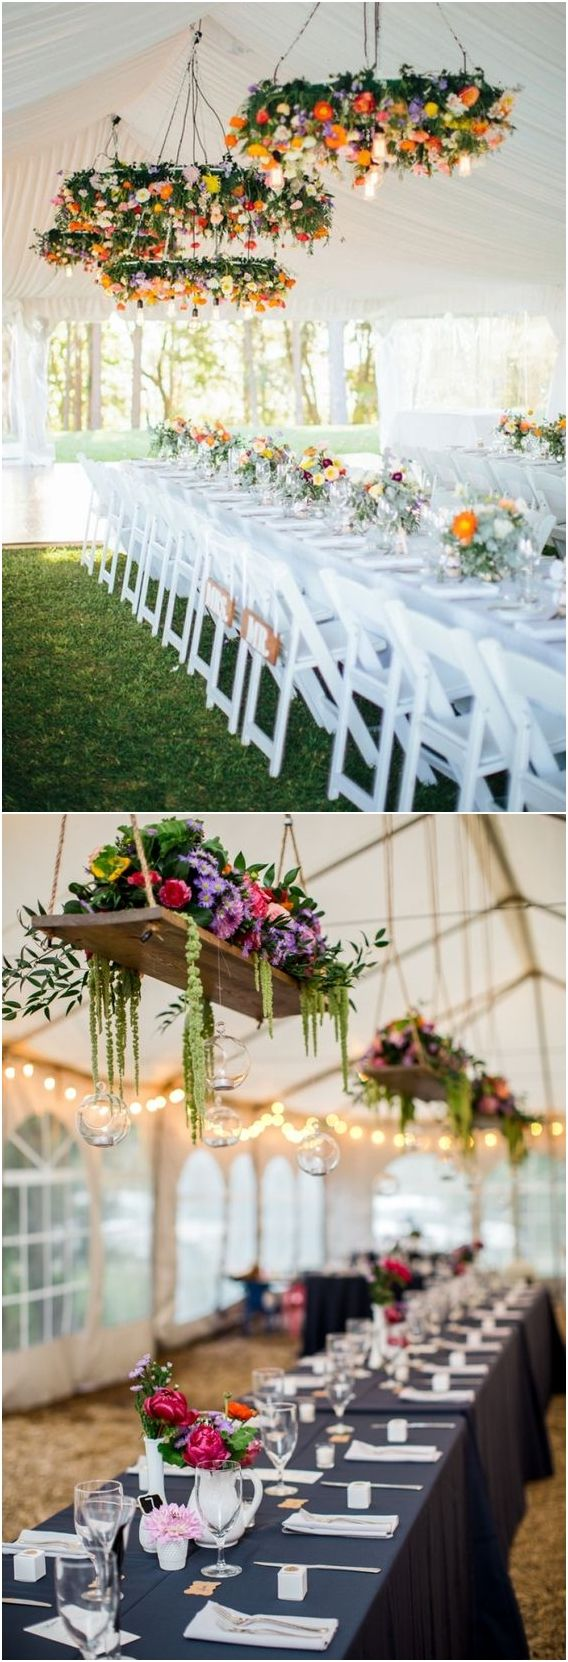 Wedding tent decoration images   Stunning Awesome Wedding Tent Decor Ideas  Weddingideas Tents